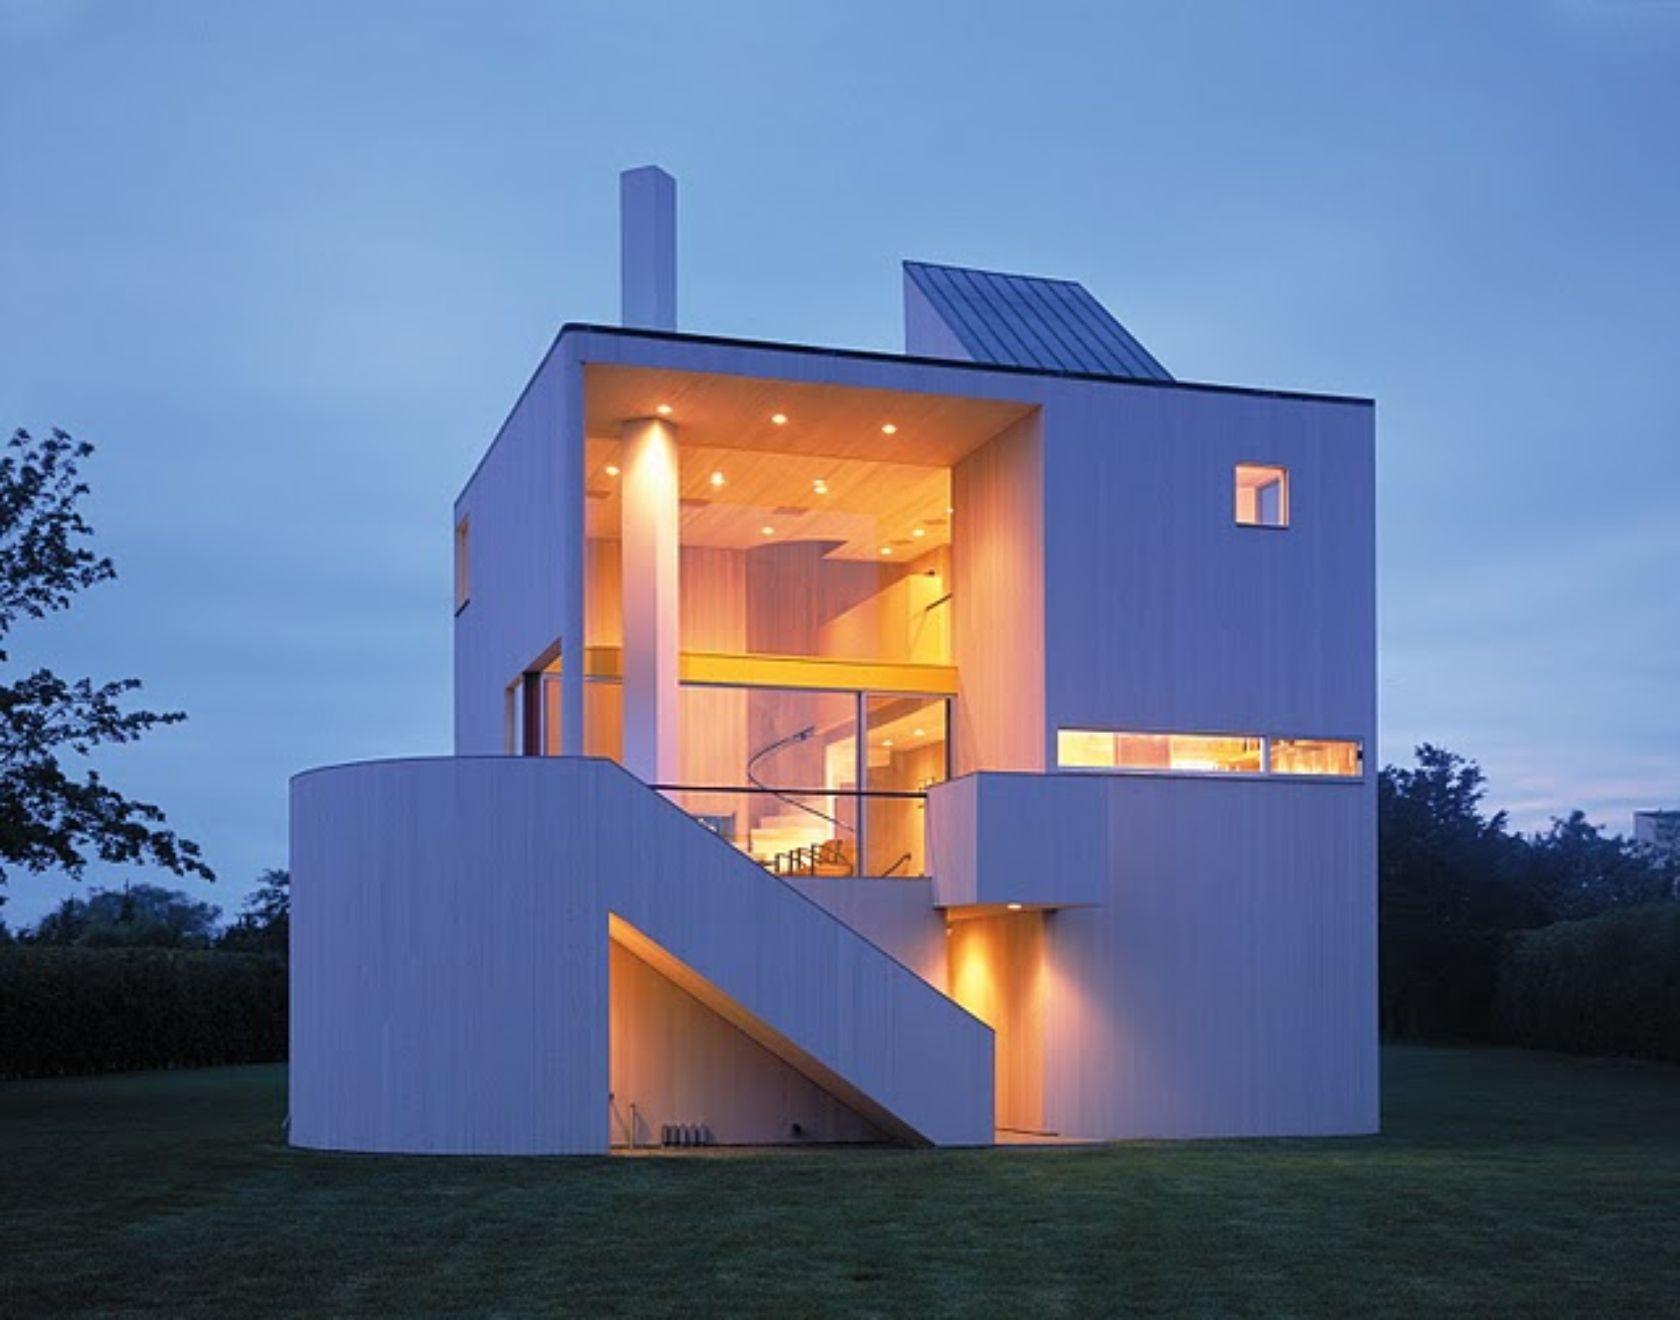 Gwathmey Residence And Studio | Amagansett, New York | Gwathmey Siegel U0026  Associates Architects | Design Inspirations